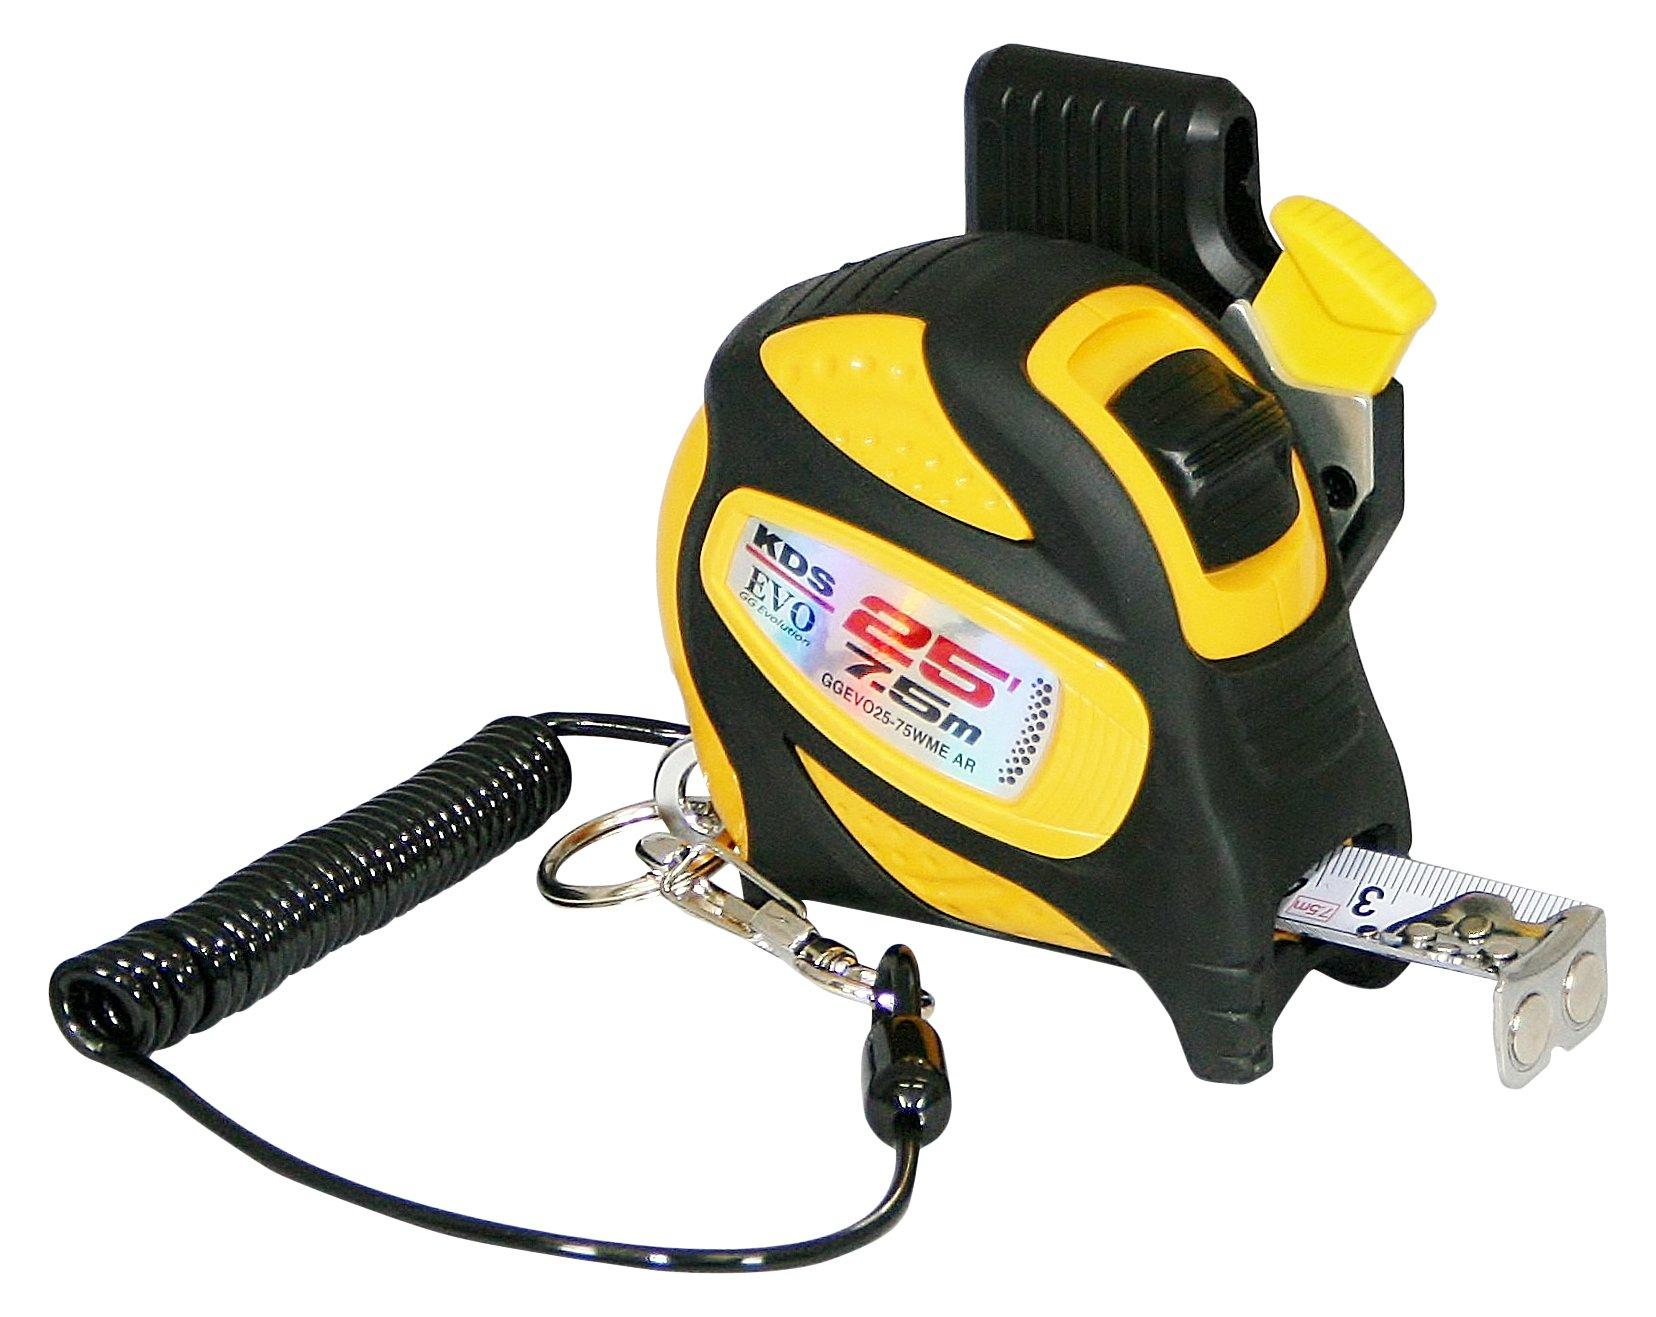 KDS GGEVO25-75WME AR BP GoodGrip Drop Protection Safety Measuring Tape, 1''/25', Yellow/Black